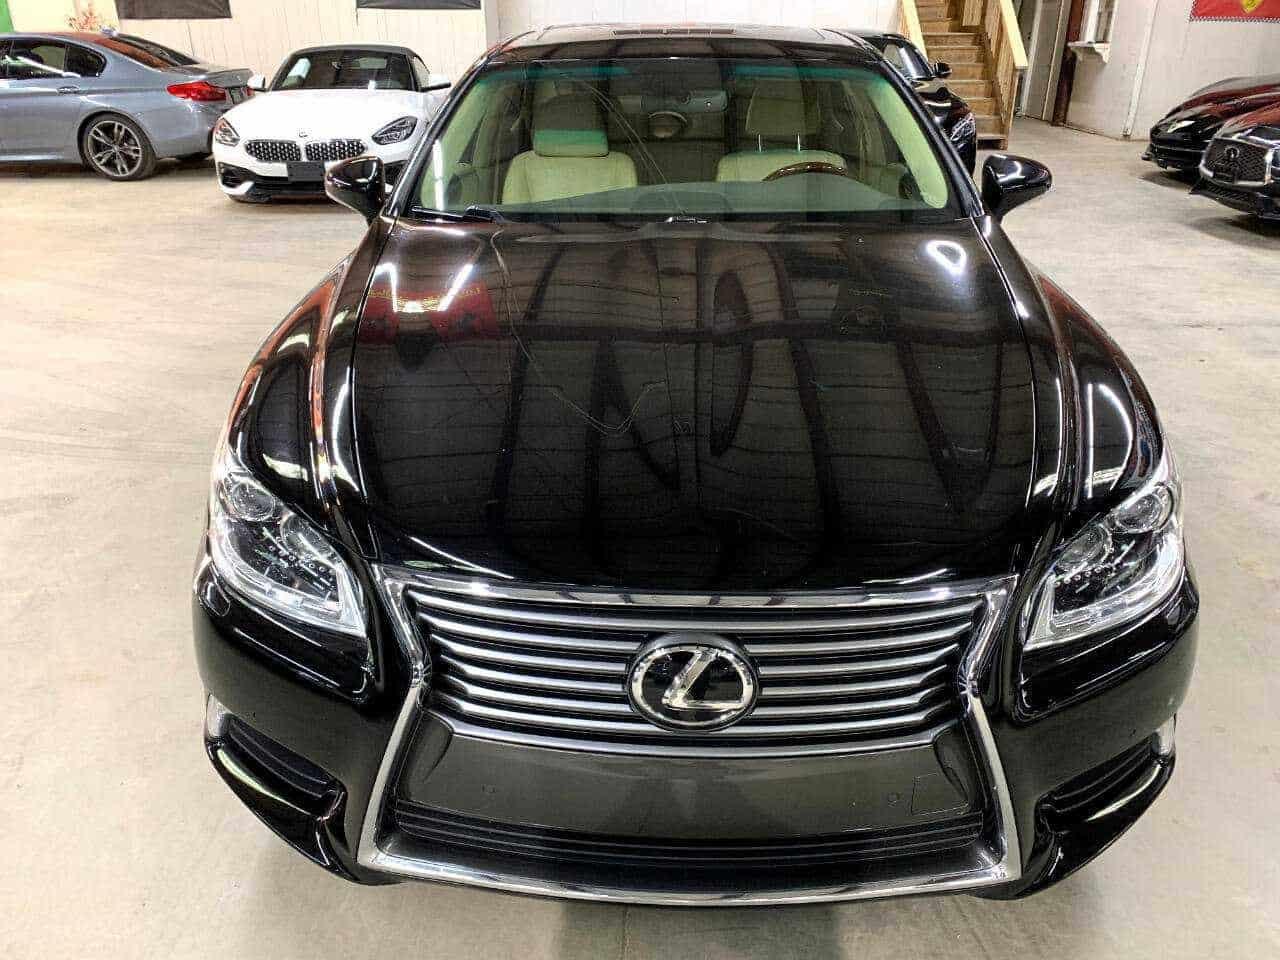 New black Lexus front view